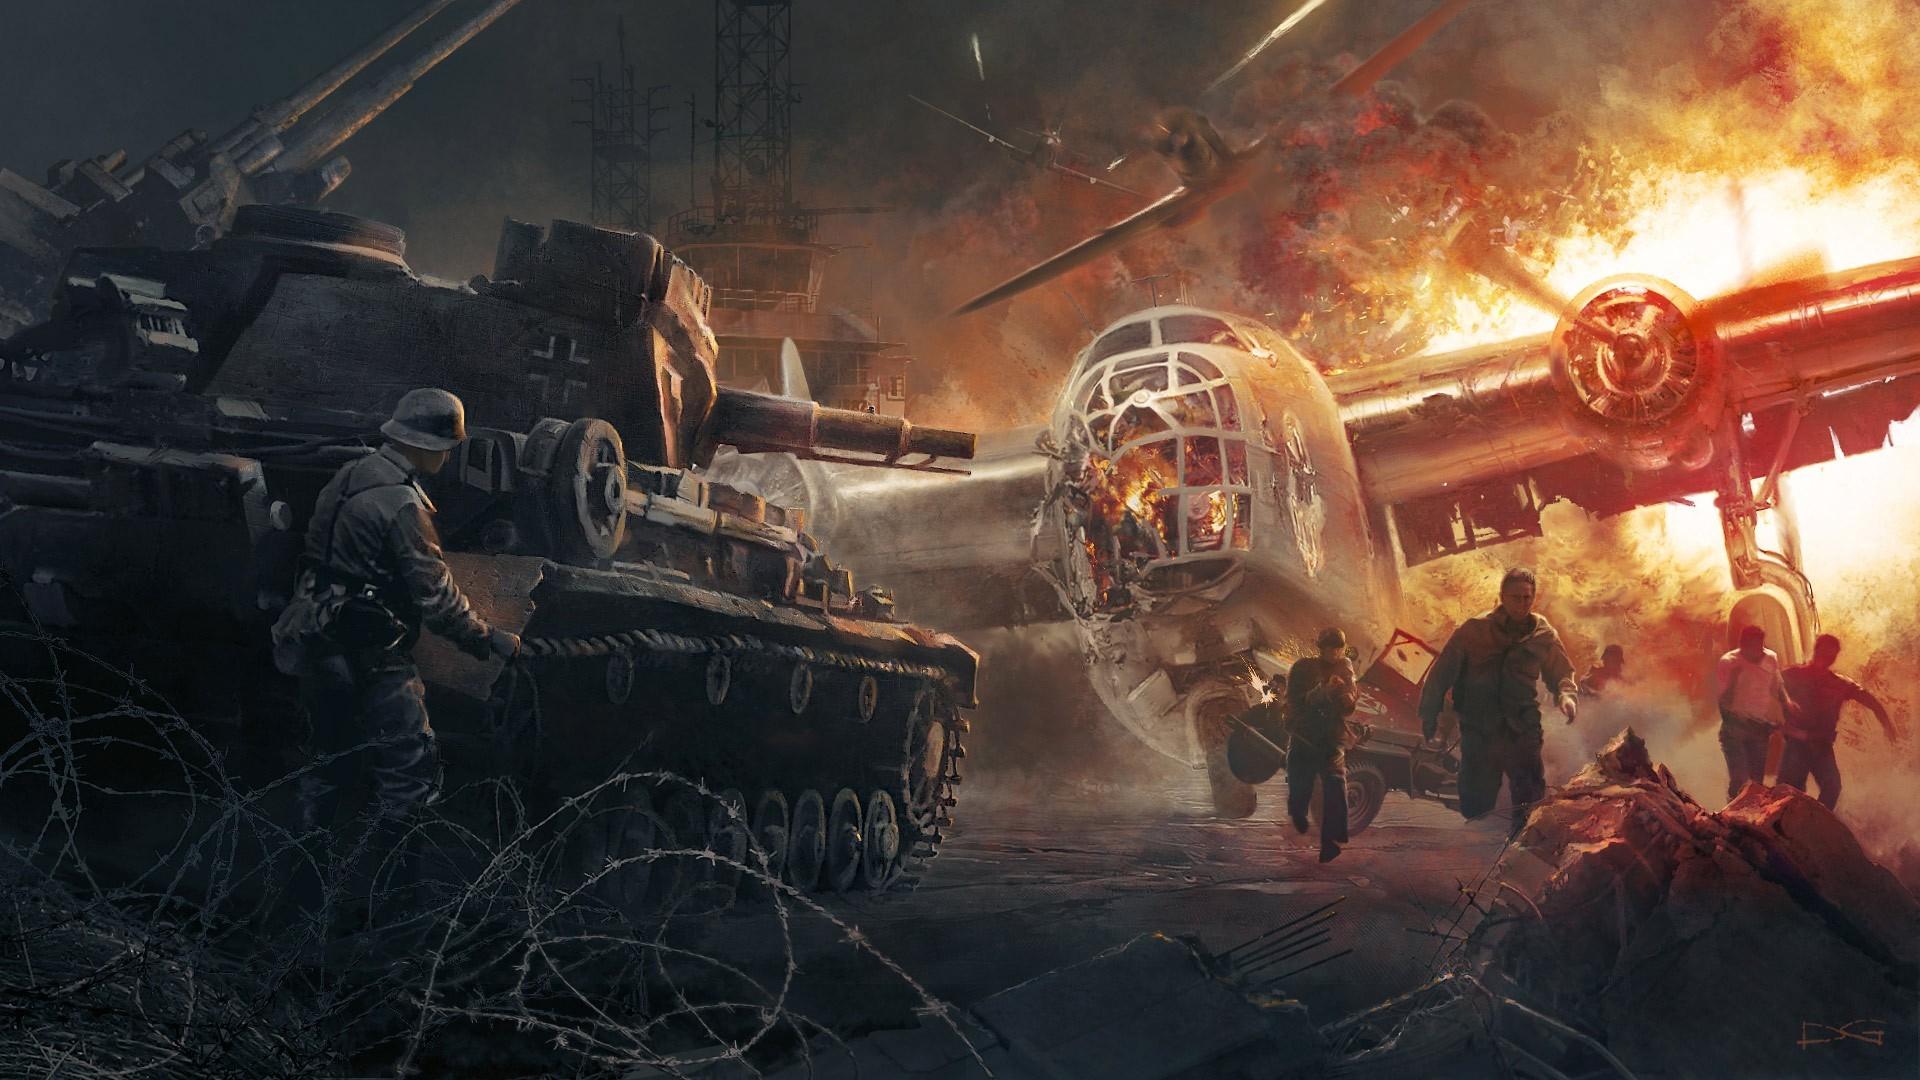 Military Battle World War II World War Airplane Bomber Explosion Fire .